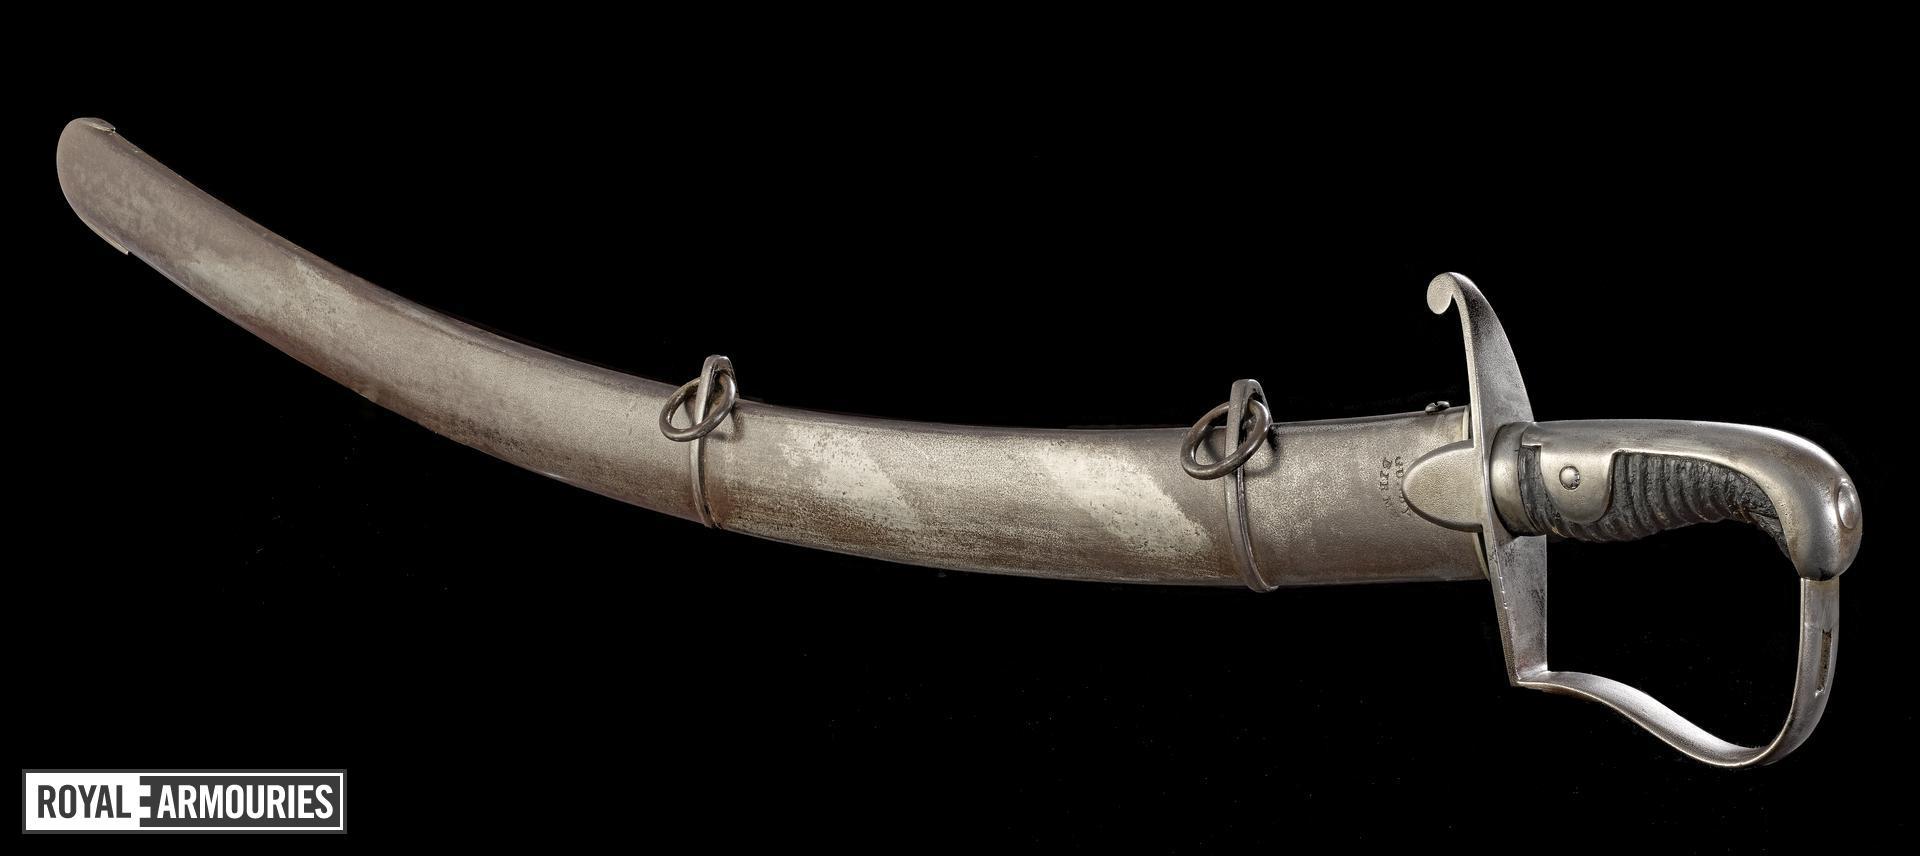 Light Cavalry Trooper sword, Pattern 1796, Britain, Birmingham, 1808-1820 (IX.245)